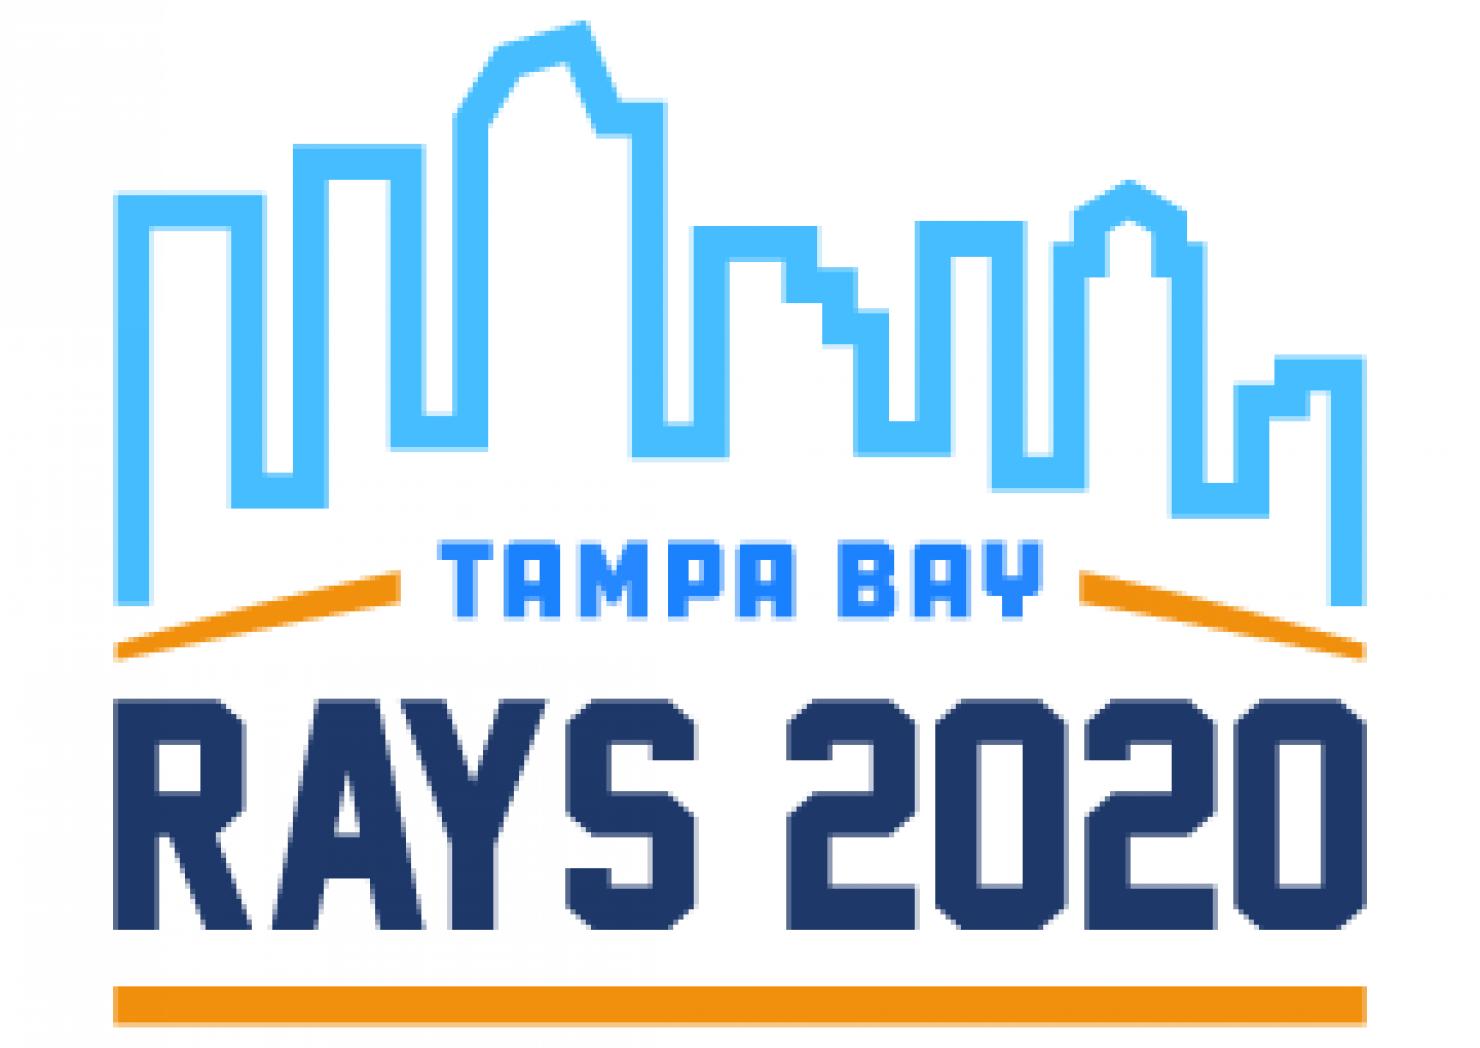 Rays Vision for Ybor City Ballpark